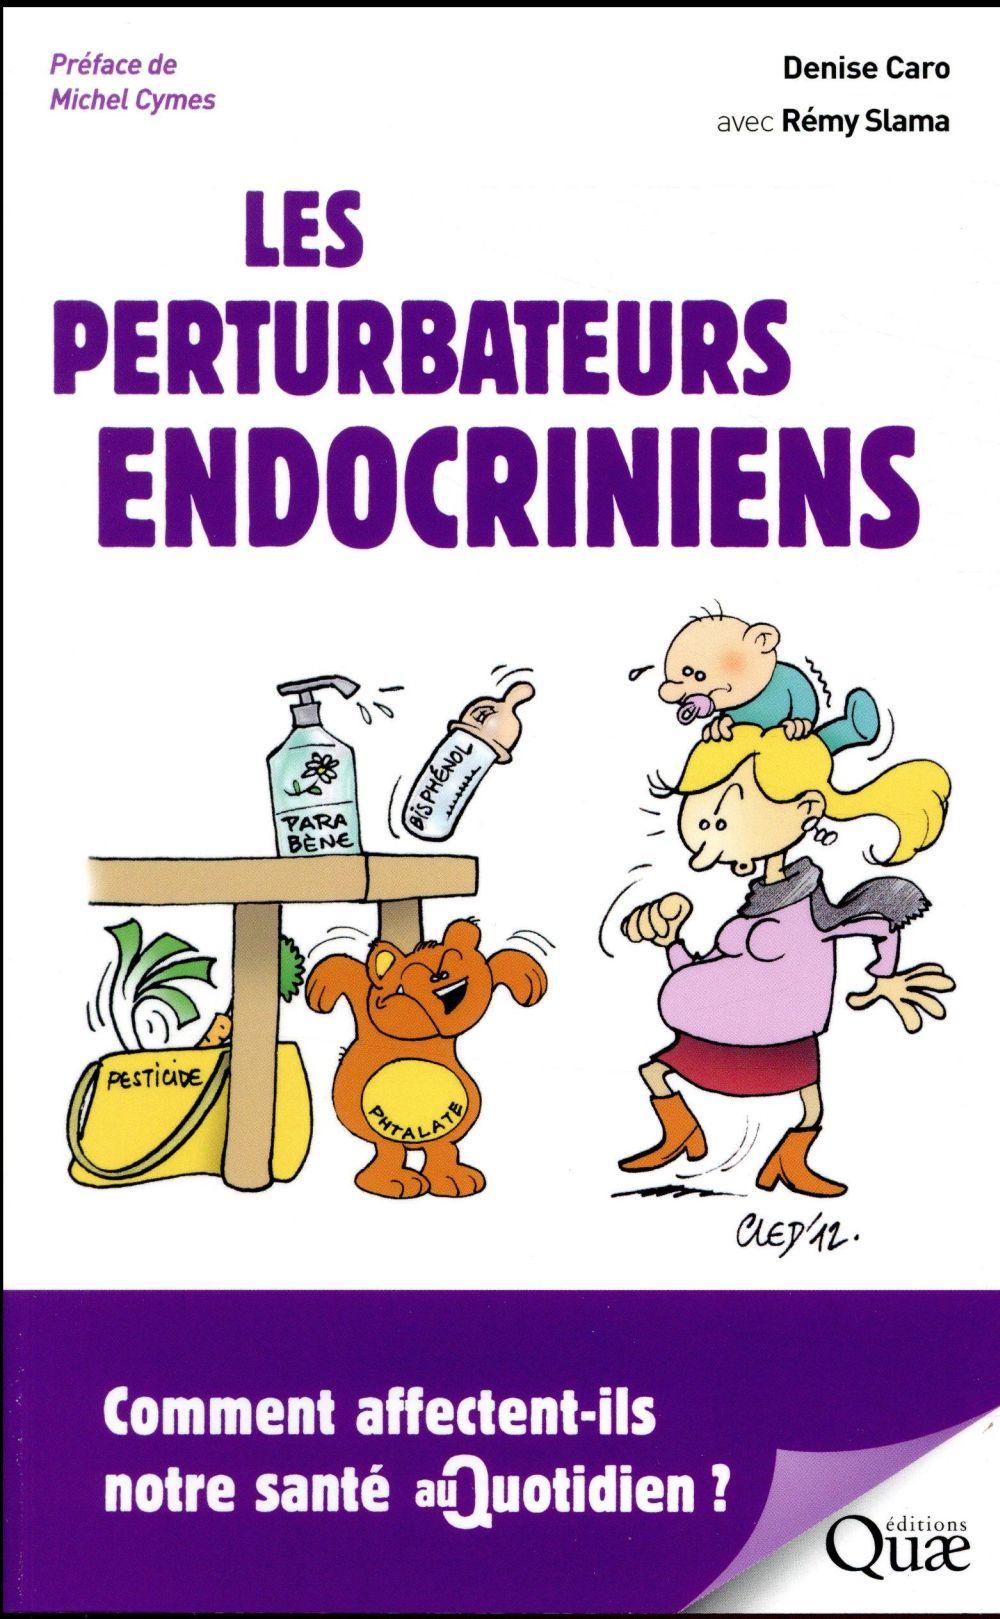 Les pertubateurs endocriniens